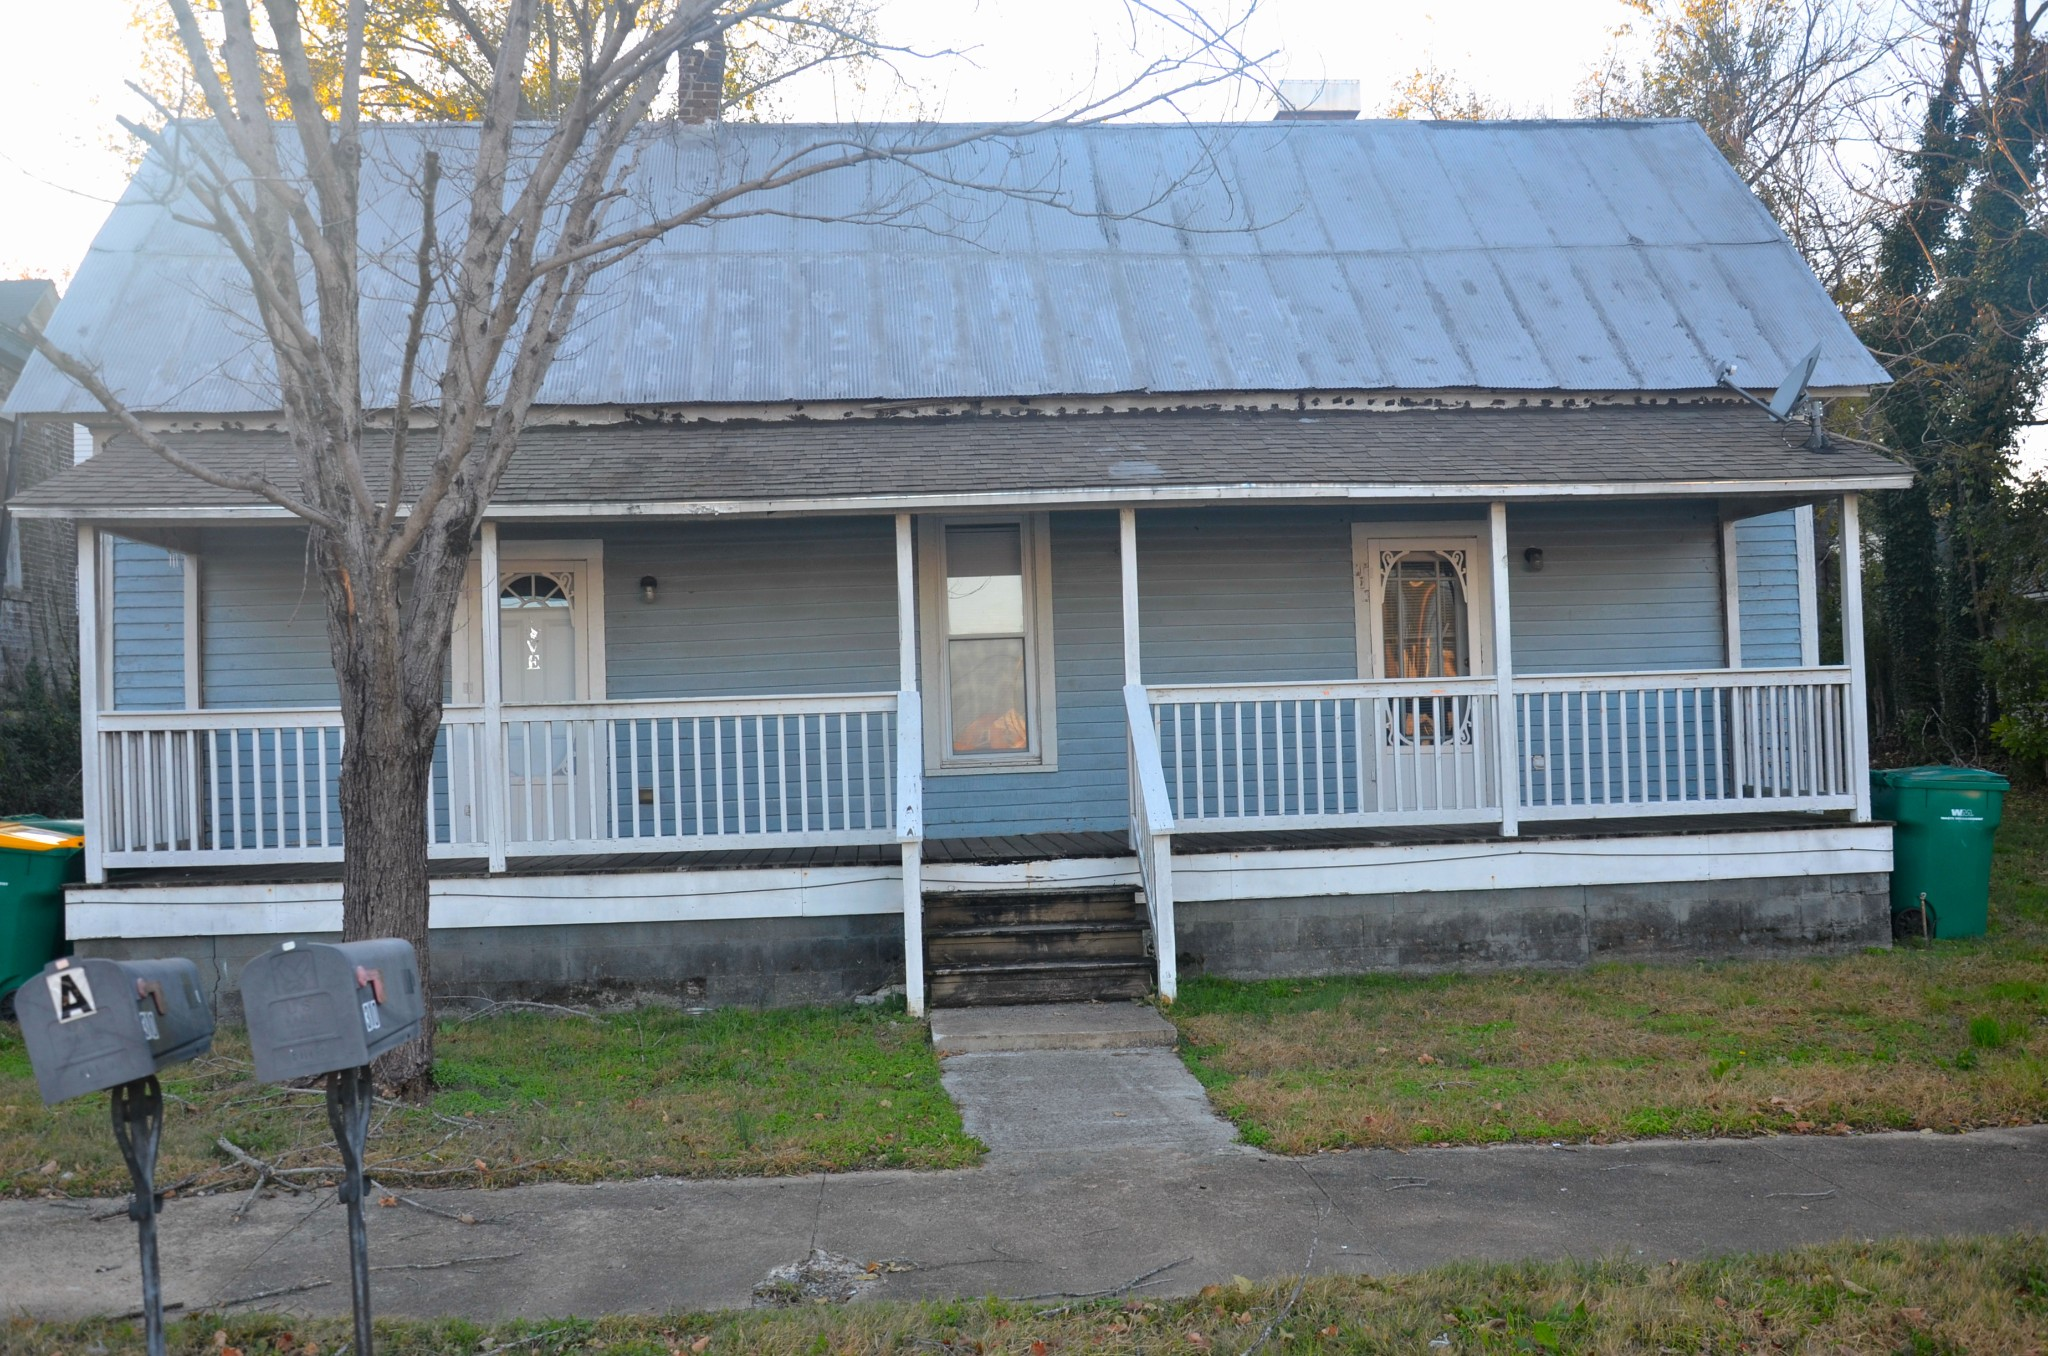 310 3Rd Ave N, Lewisburg, TN 37091 - Lewisburg, TN real estate listing